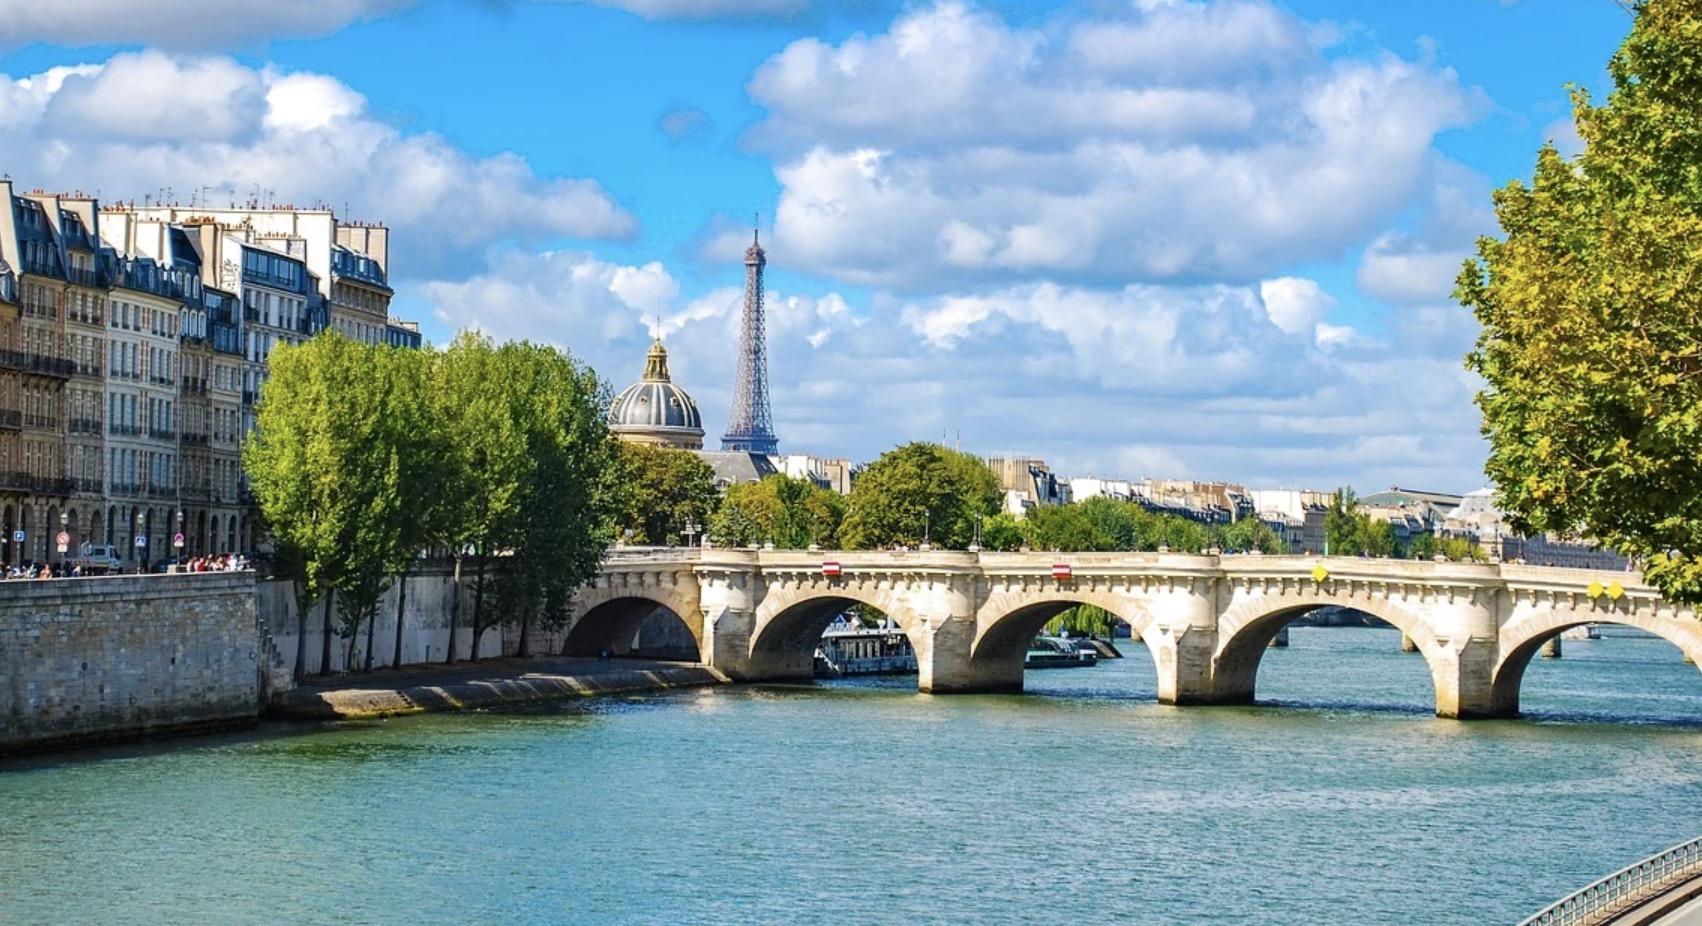 Quand pourra t-on se rebaigner dans la Seine ?